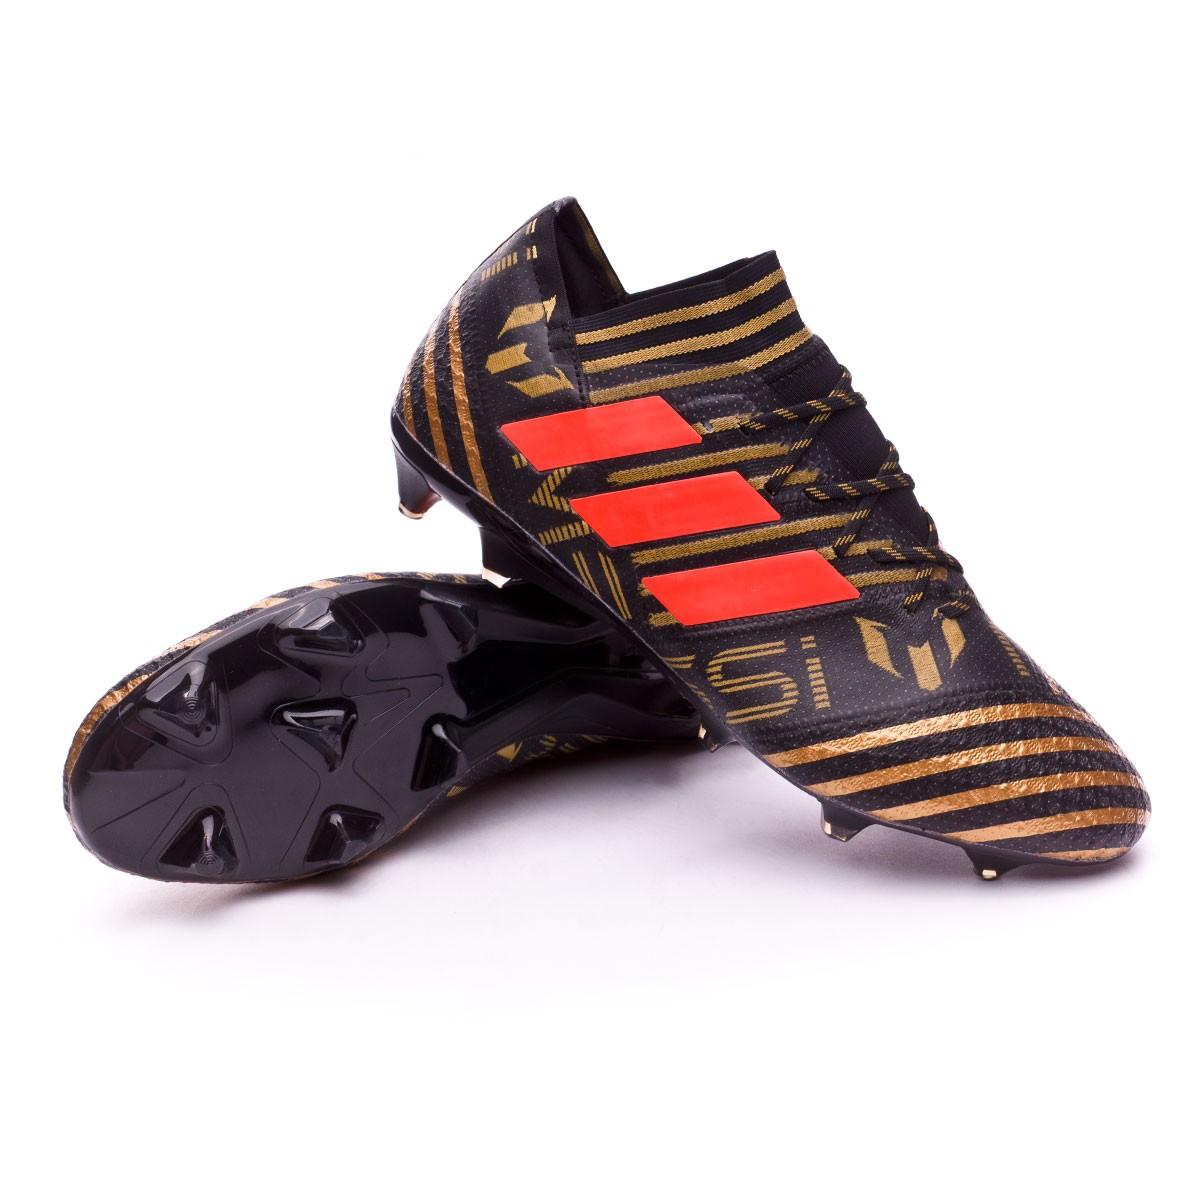 9a96afef6ac9 Football Boots adidas Nemeziz Messi 17.1 FG Core black-Solar red ...